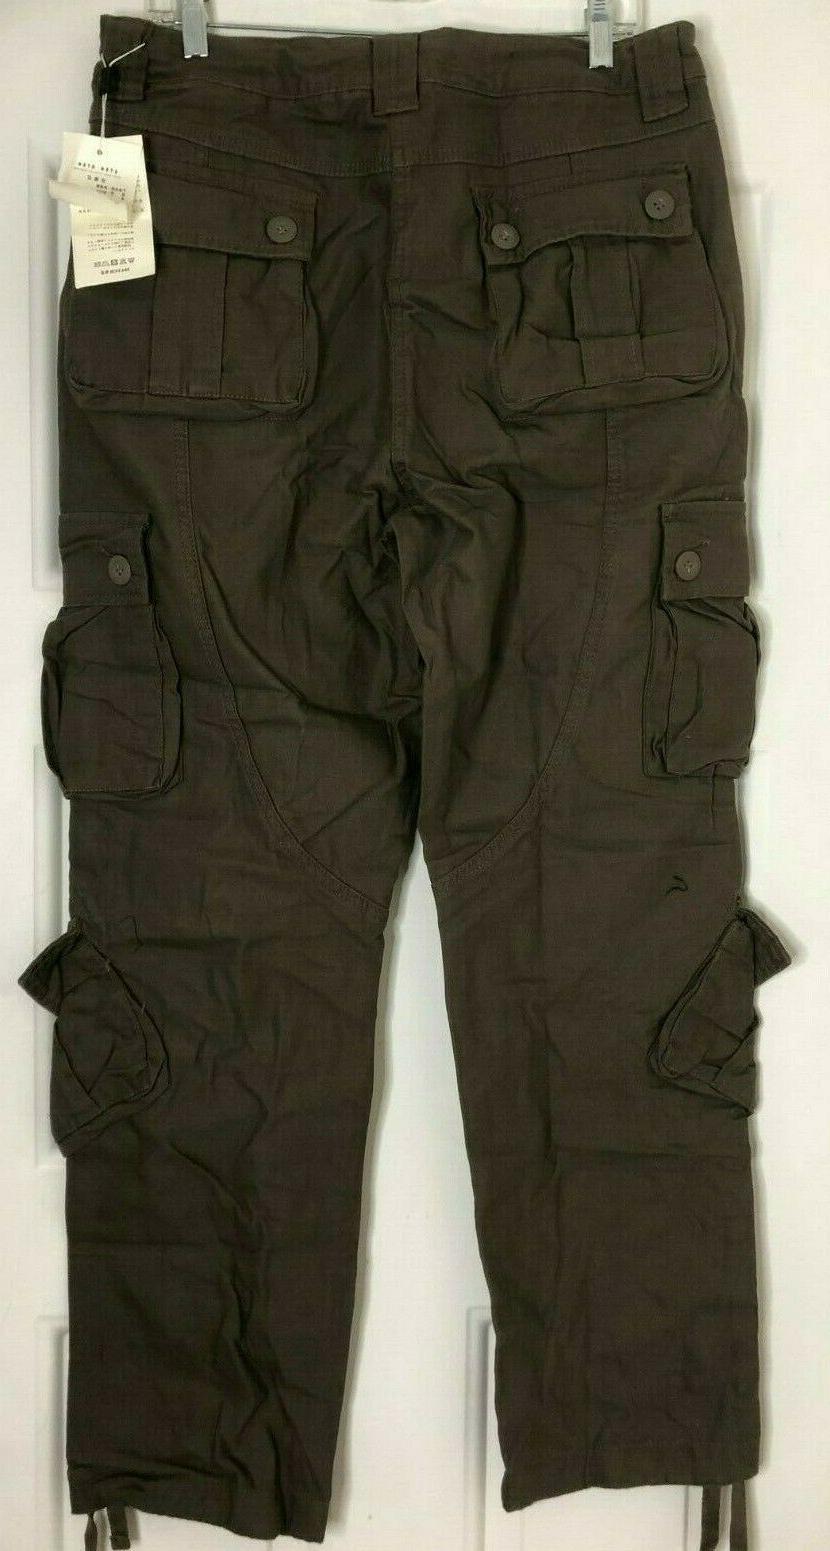 Match Wild Pants, Dark